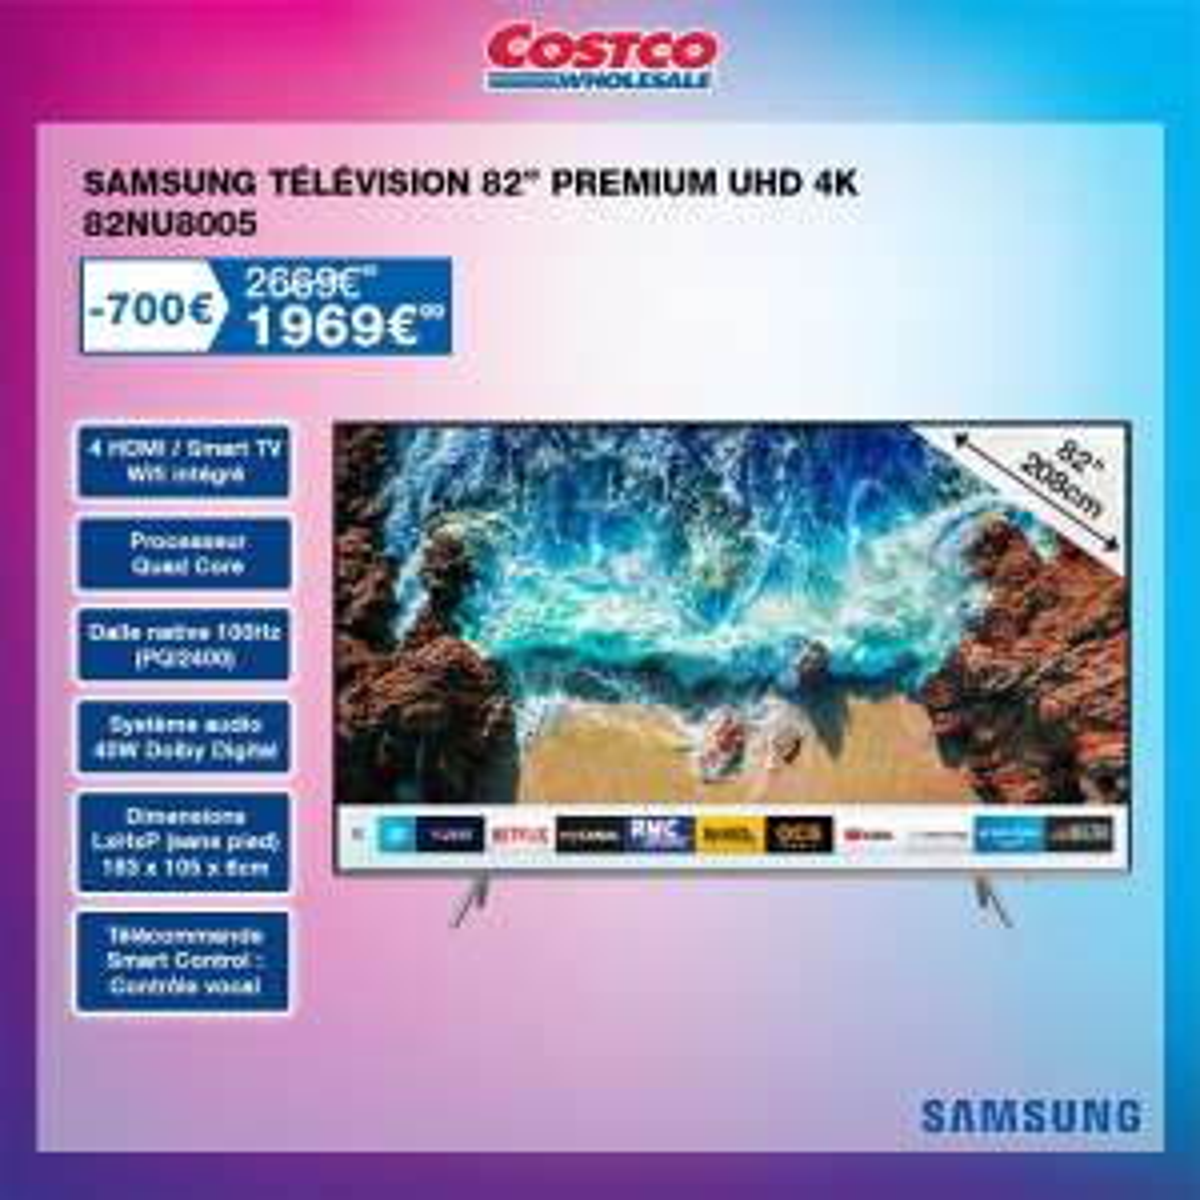 "[Carte CostCo] TV 82"" Samsung NU8005 - 4K UHD, Smart TV (Villebon-sur-Yvette 91)"